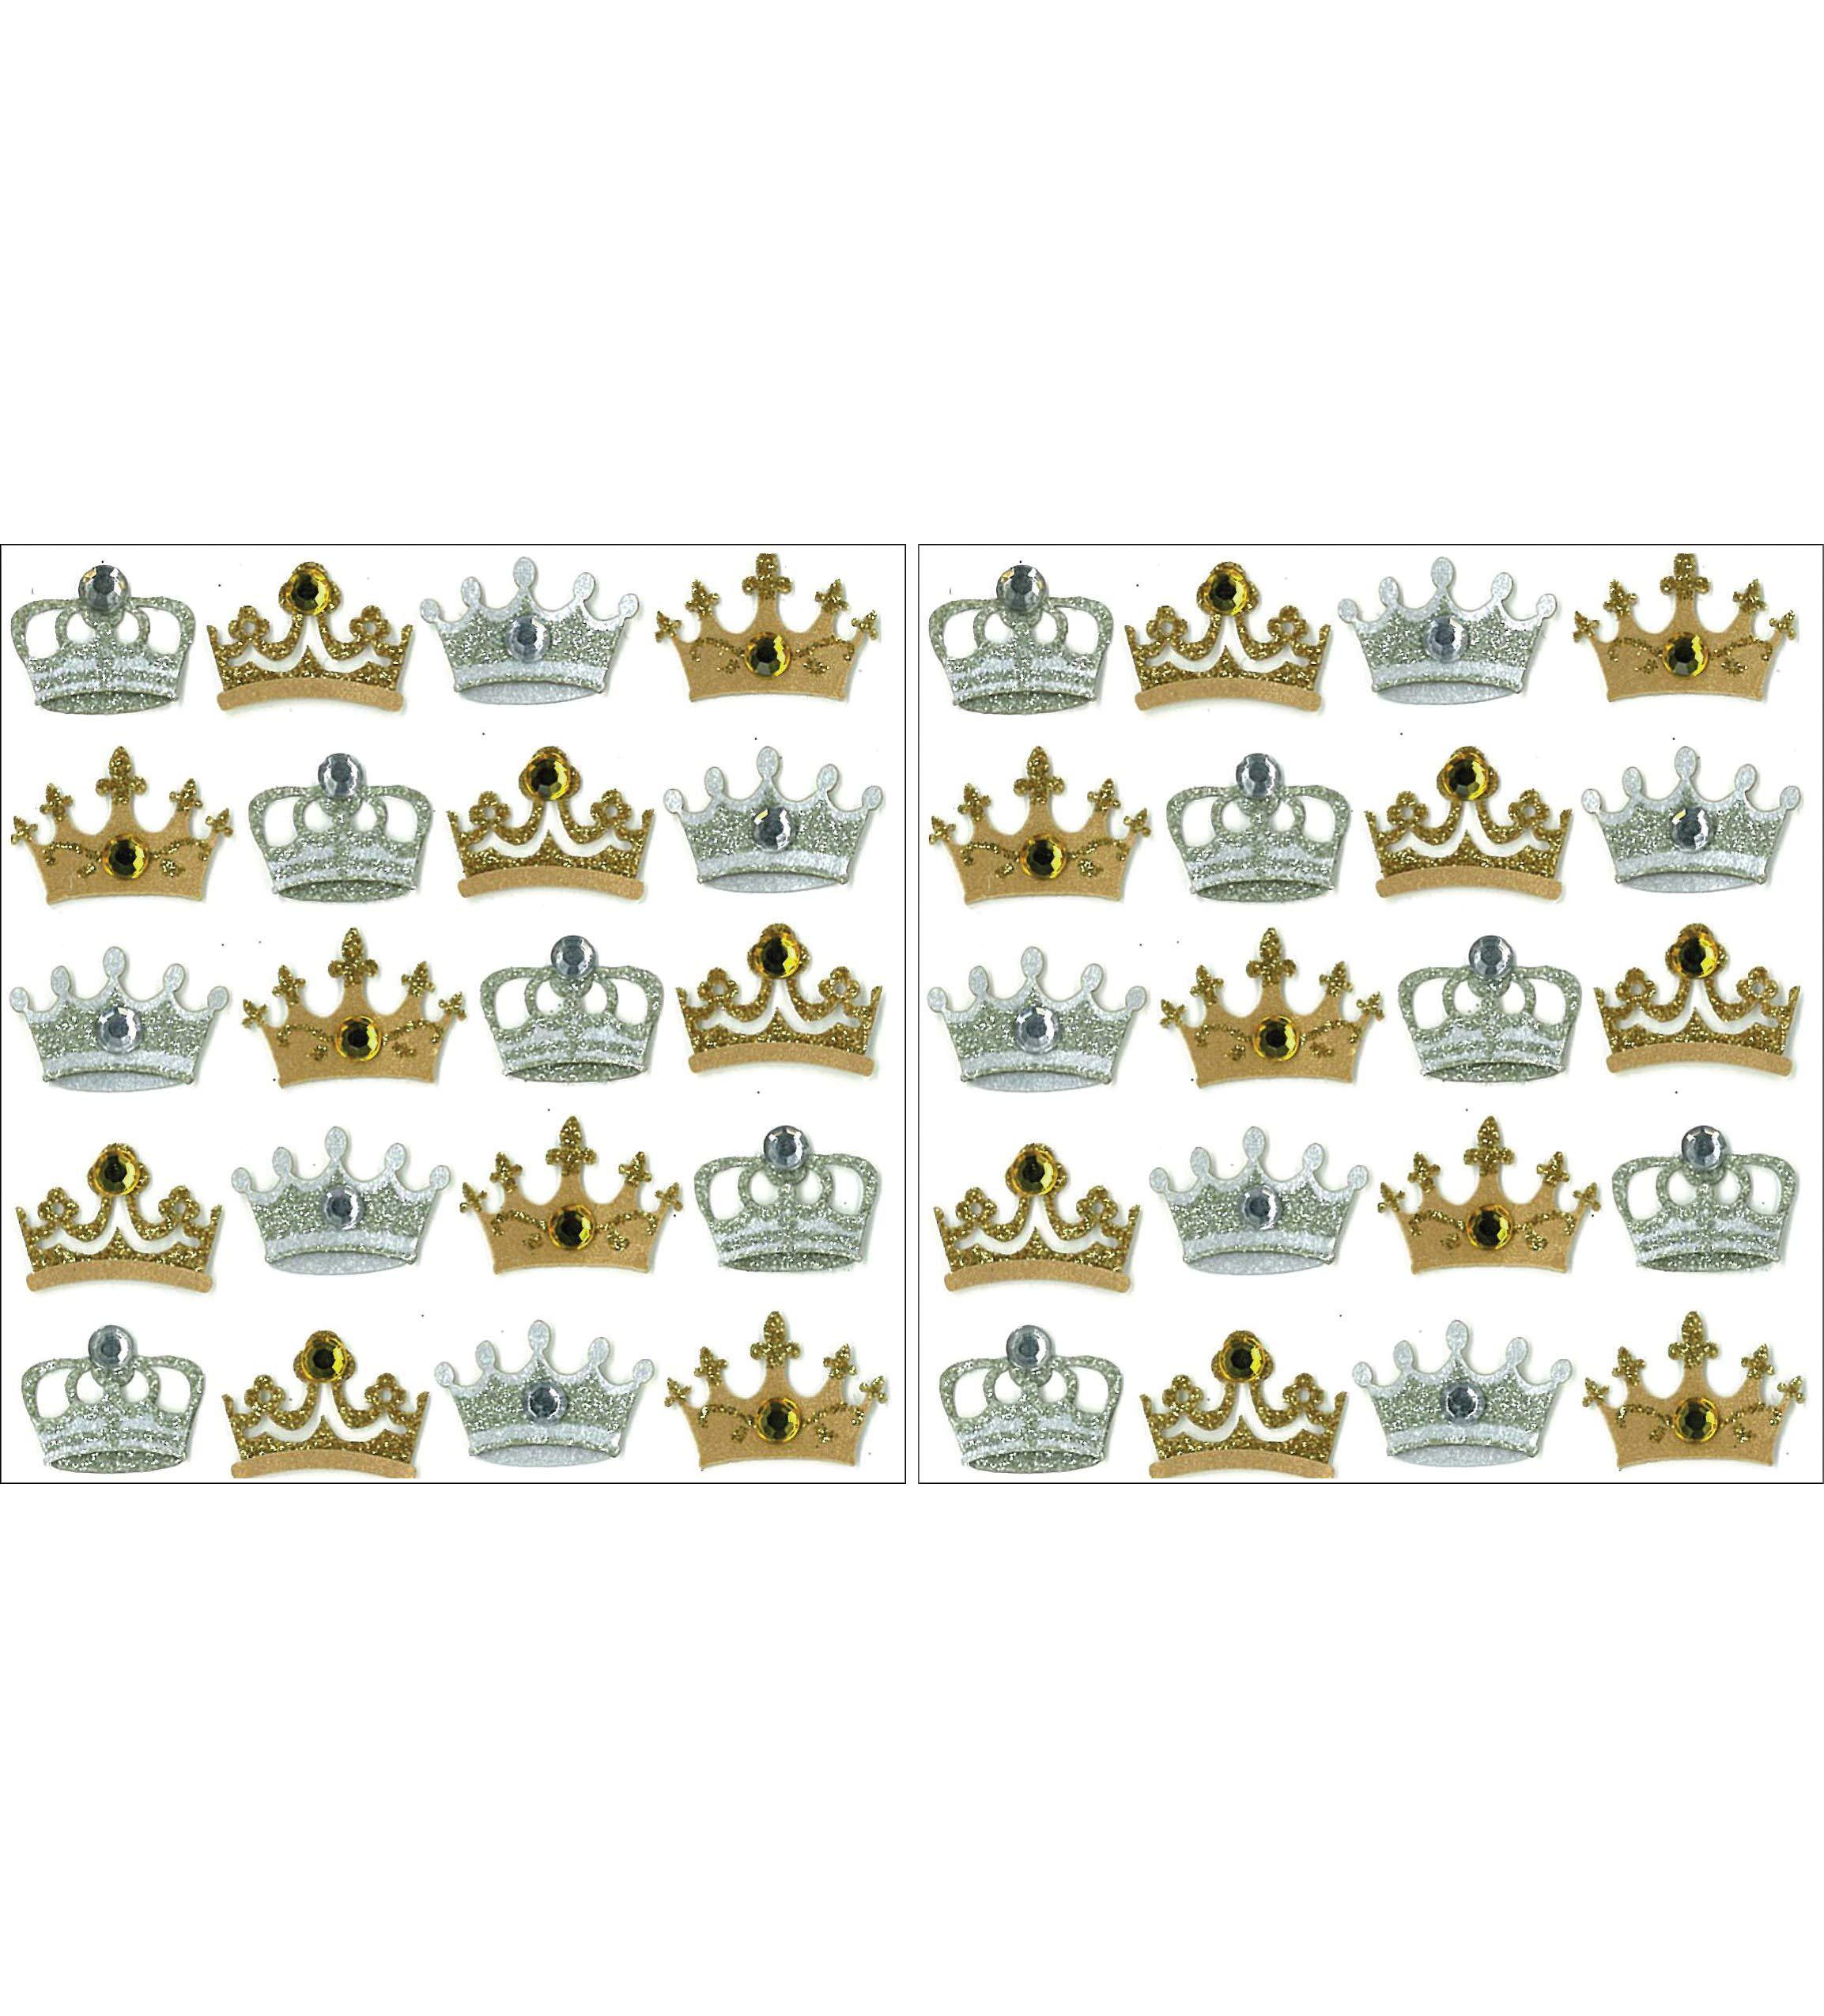 Jolee's Boutique Dimensional Repeat Stickers, Crowns (Twо Pаck)